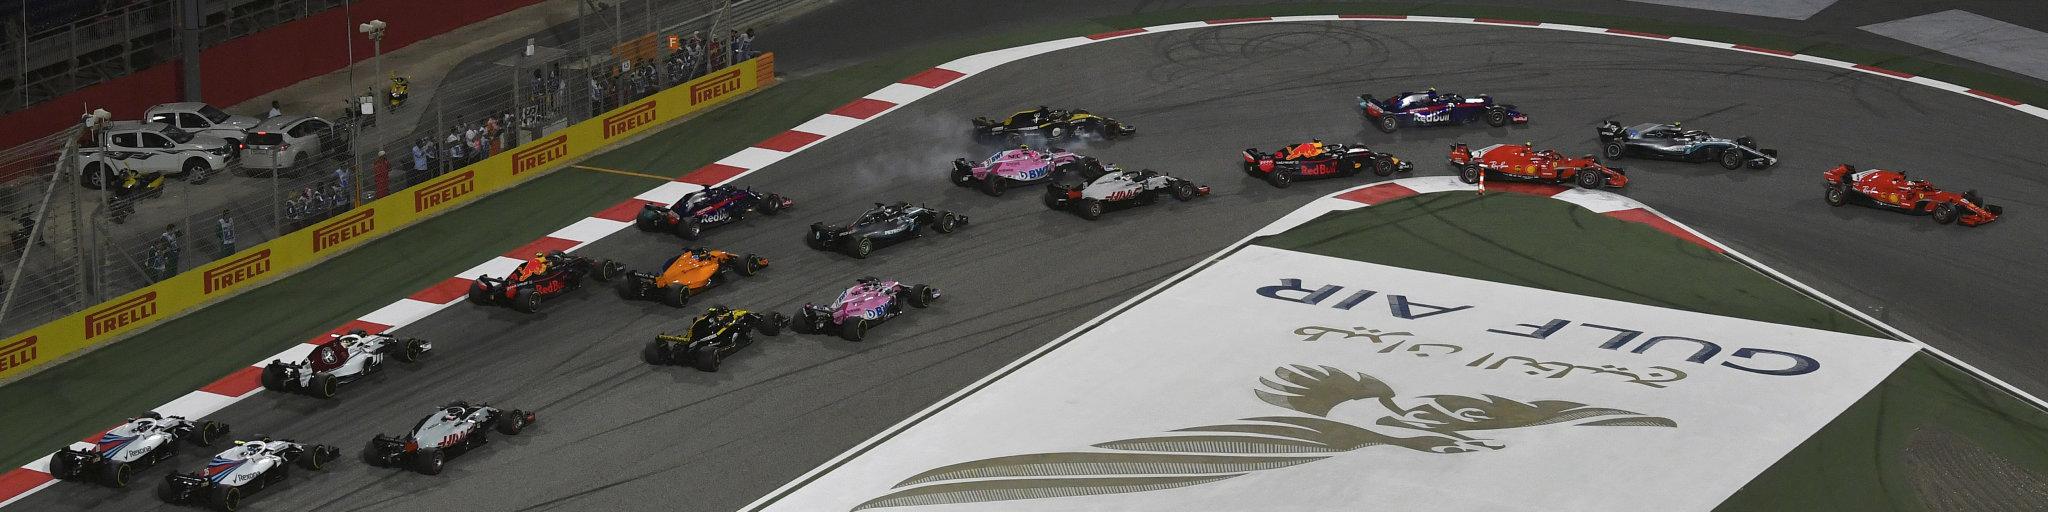 Bahrain Grand Prix Image